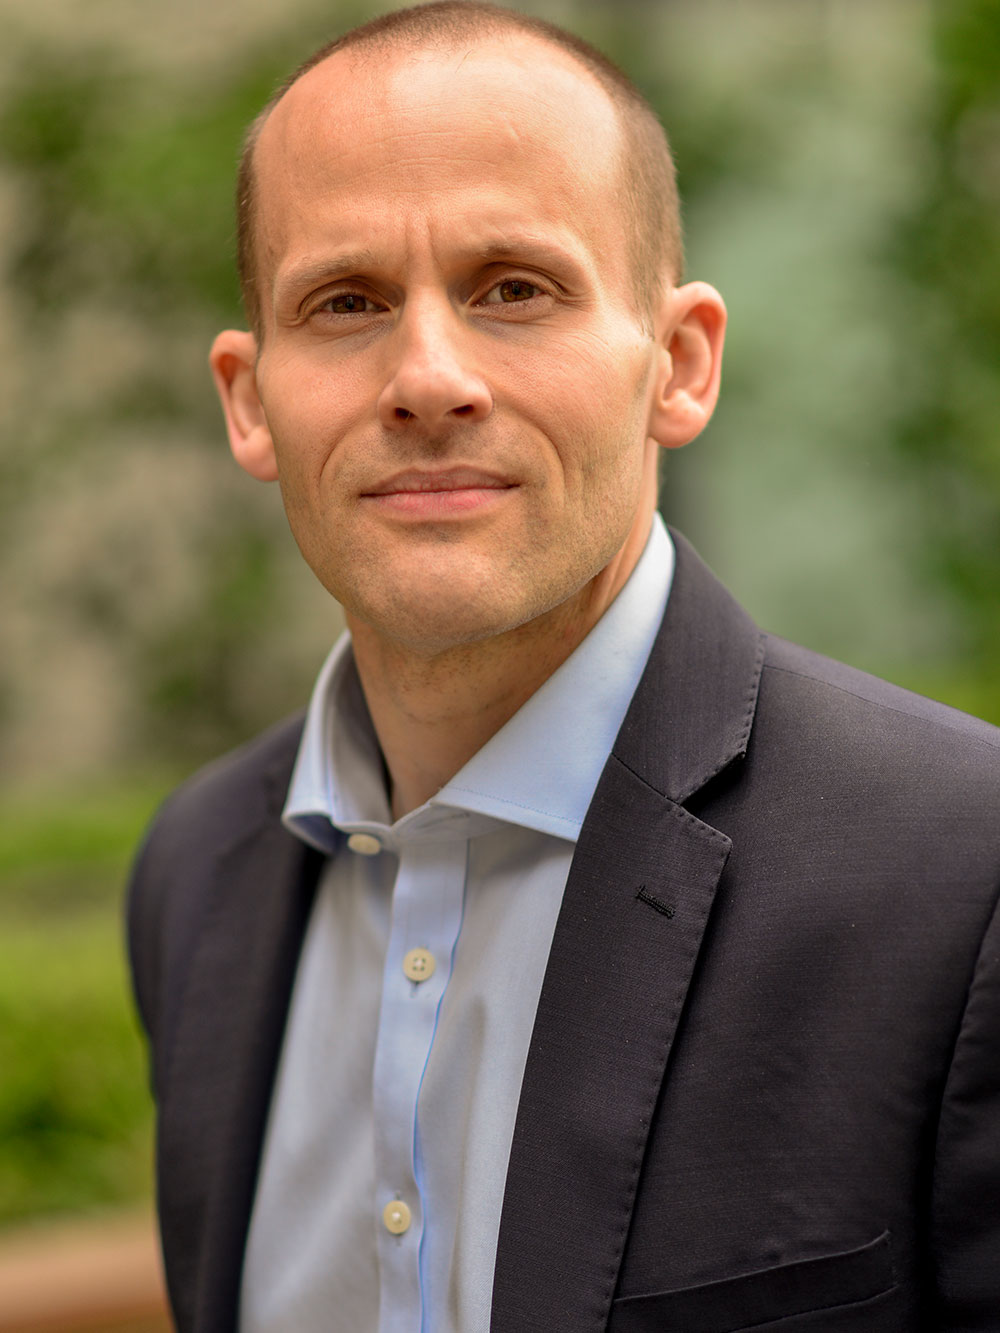 Nate Hartley, Advance Global Capital CEO & CIO